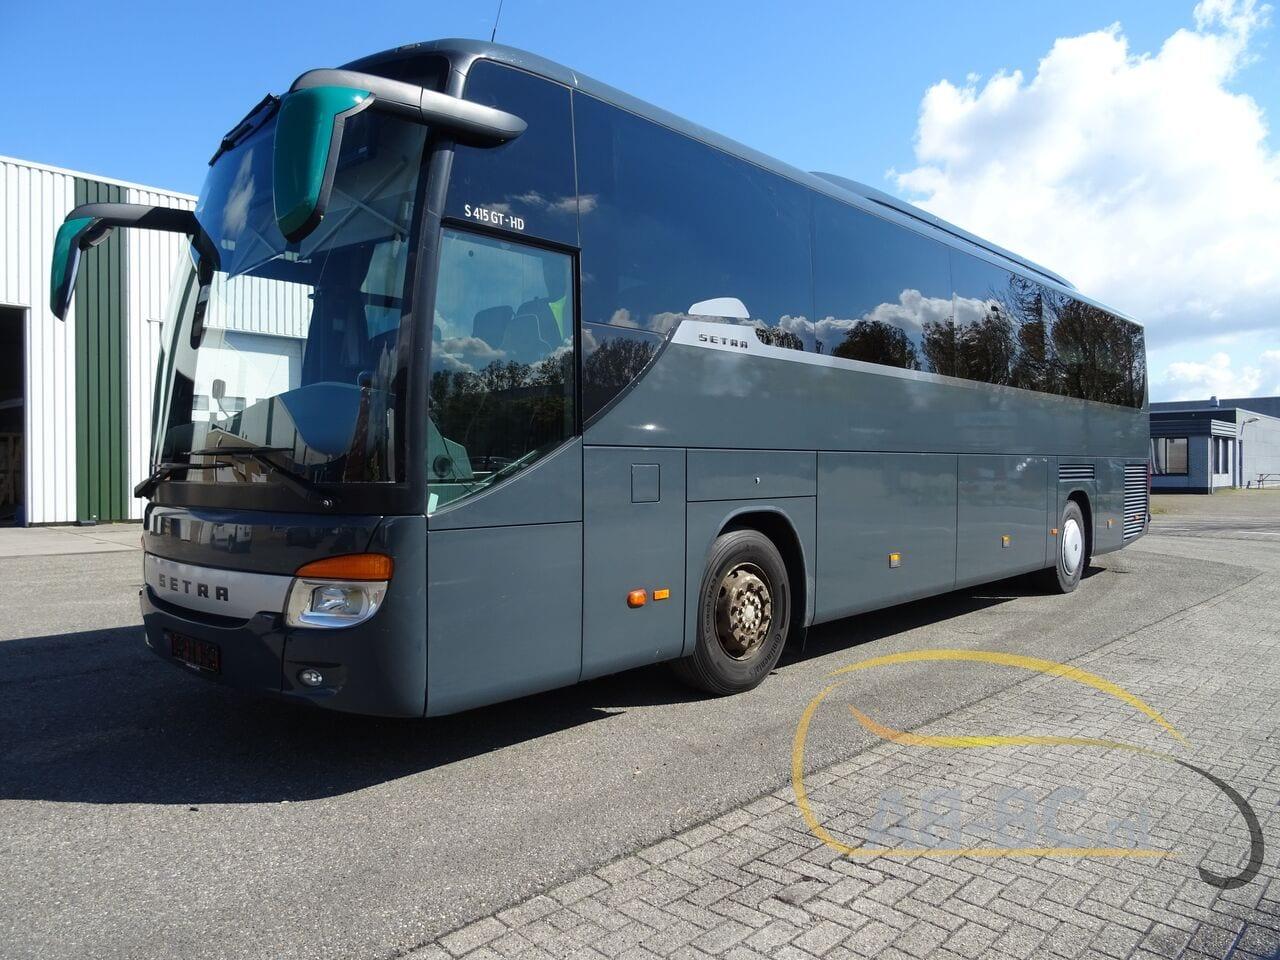 coach-busSETRA-S415-GT-HD-FINAL-EDITION-51-SEATS-LIFTBUS---1620381844798723834_big_dfcf86d4b5bcd3cdd15b804f3e756ff8--21050713010665719300